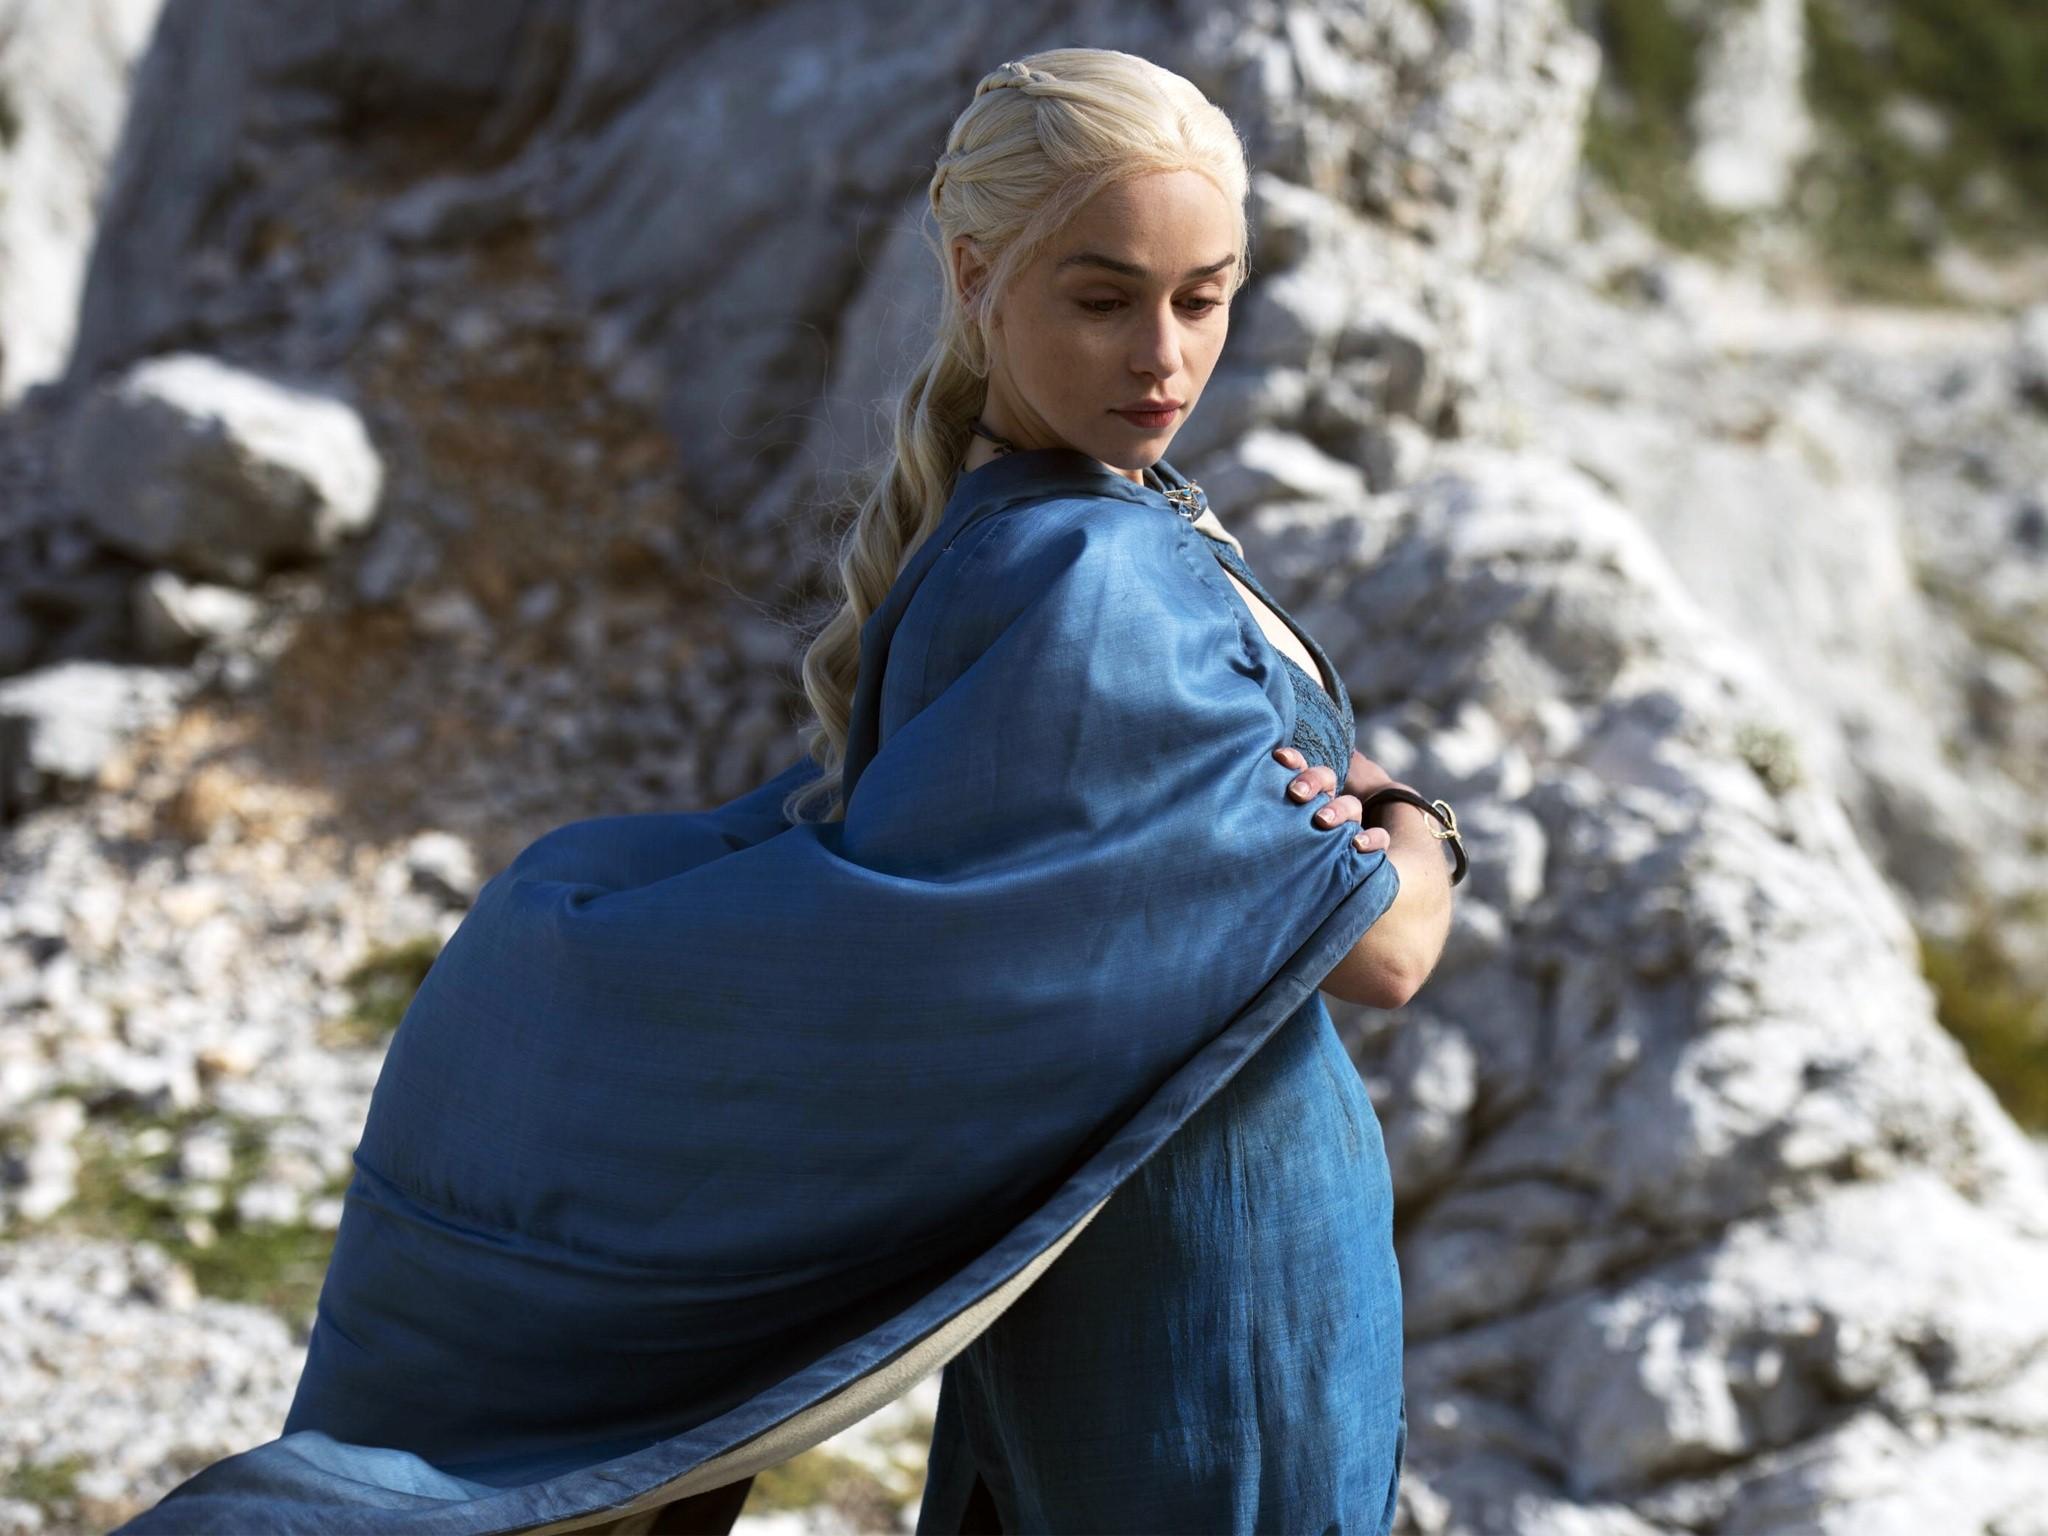 Wallpaper Daenerys Targaryen in Game of Thrones